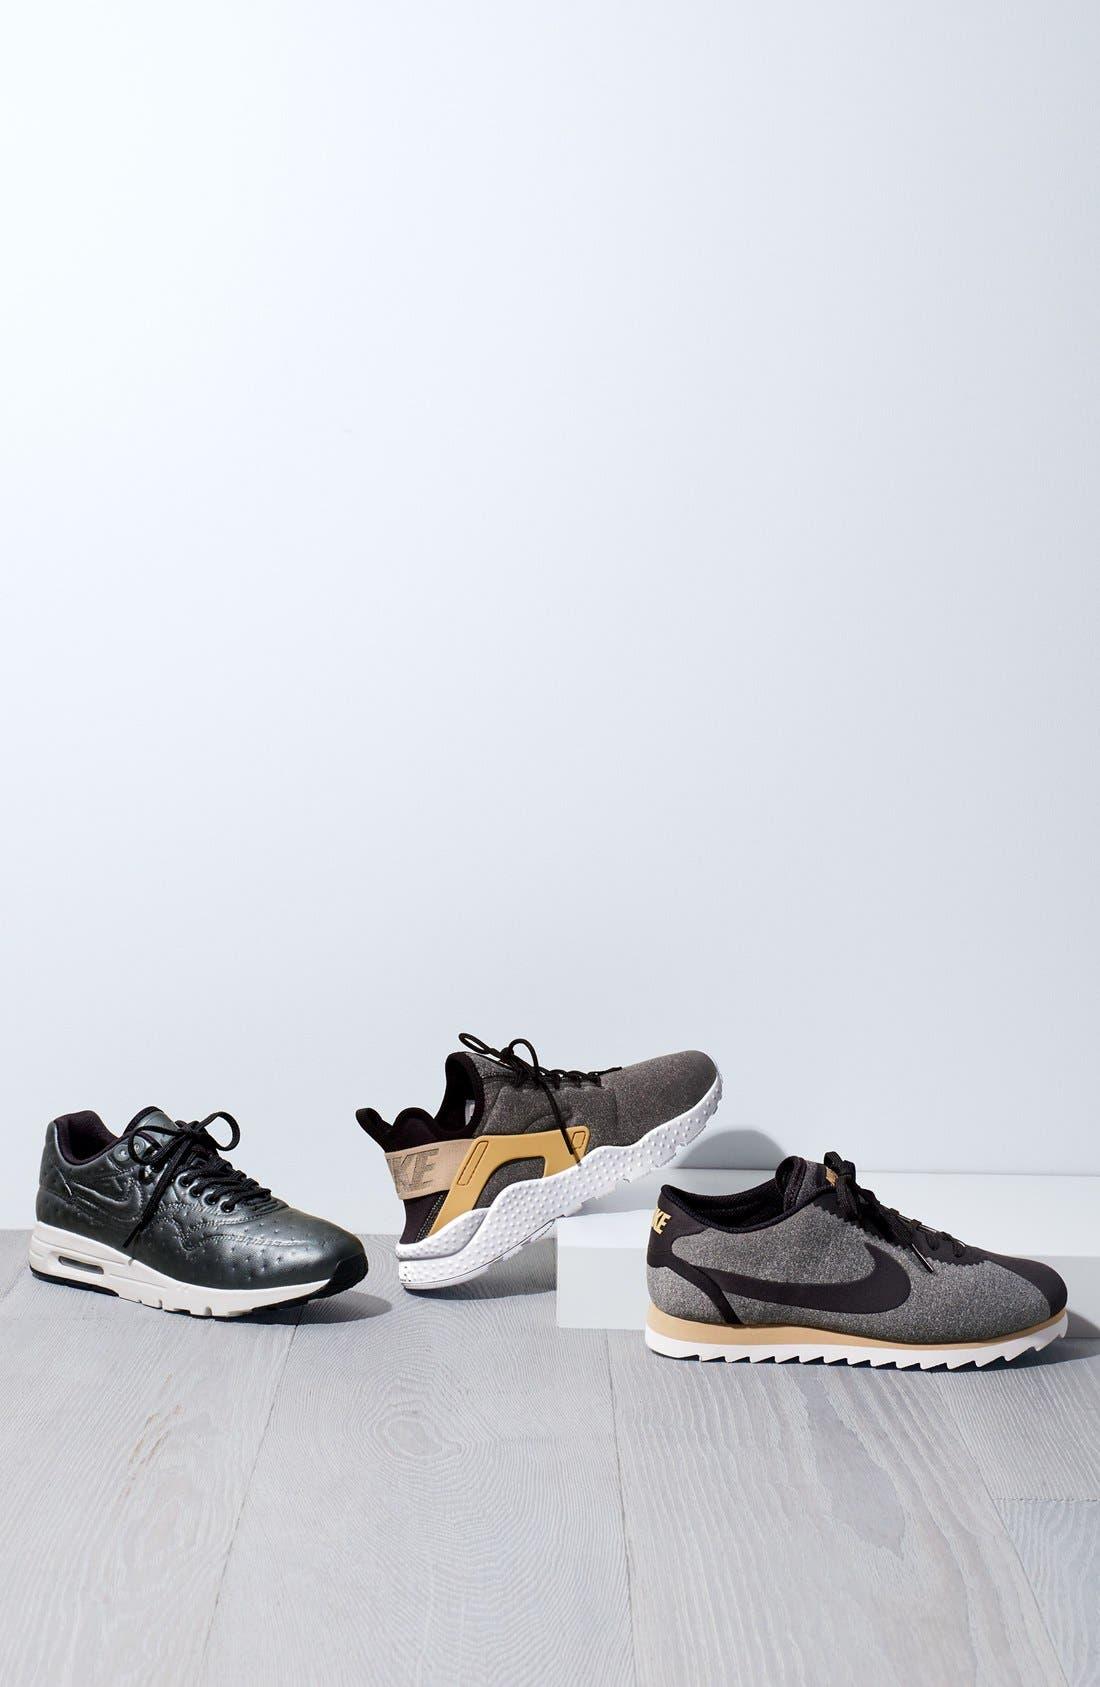 NIKE,                             'Air Huarache Run Ultra SE' Sneaker,                             Alternate thumbnail 8, color,                             285